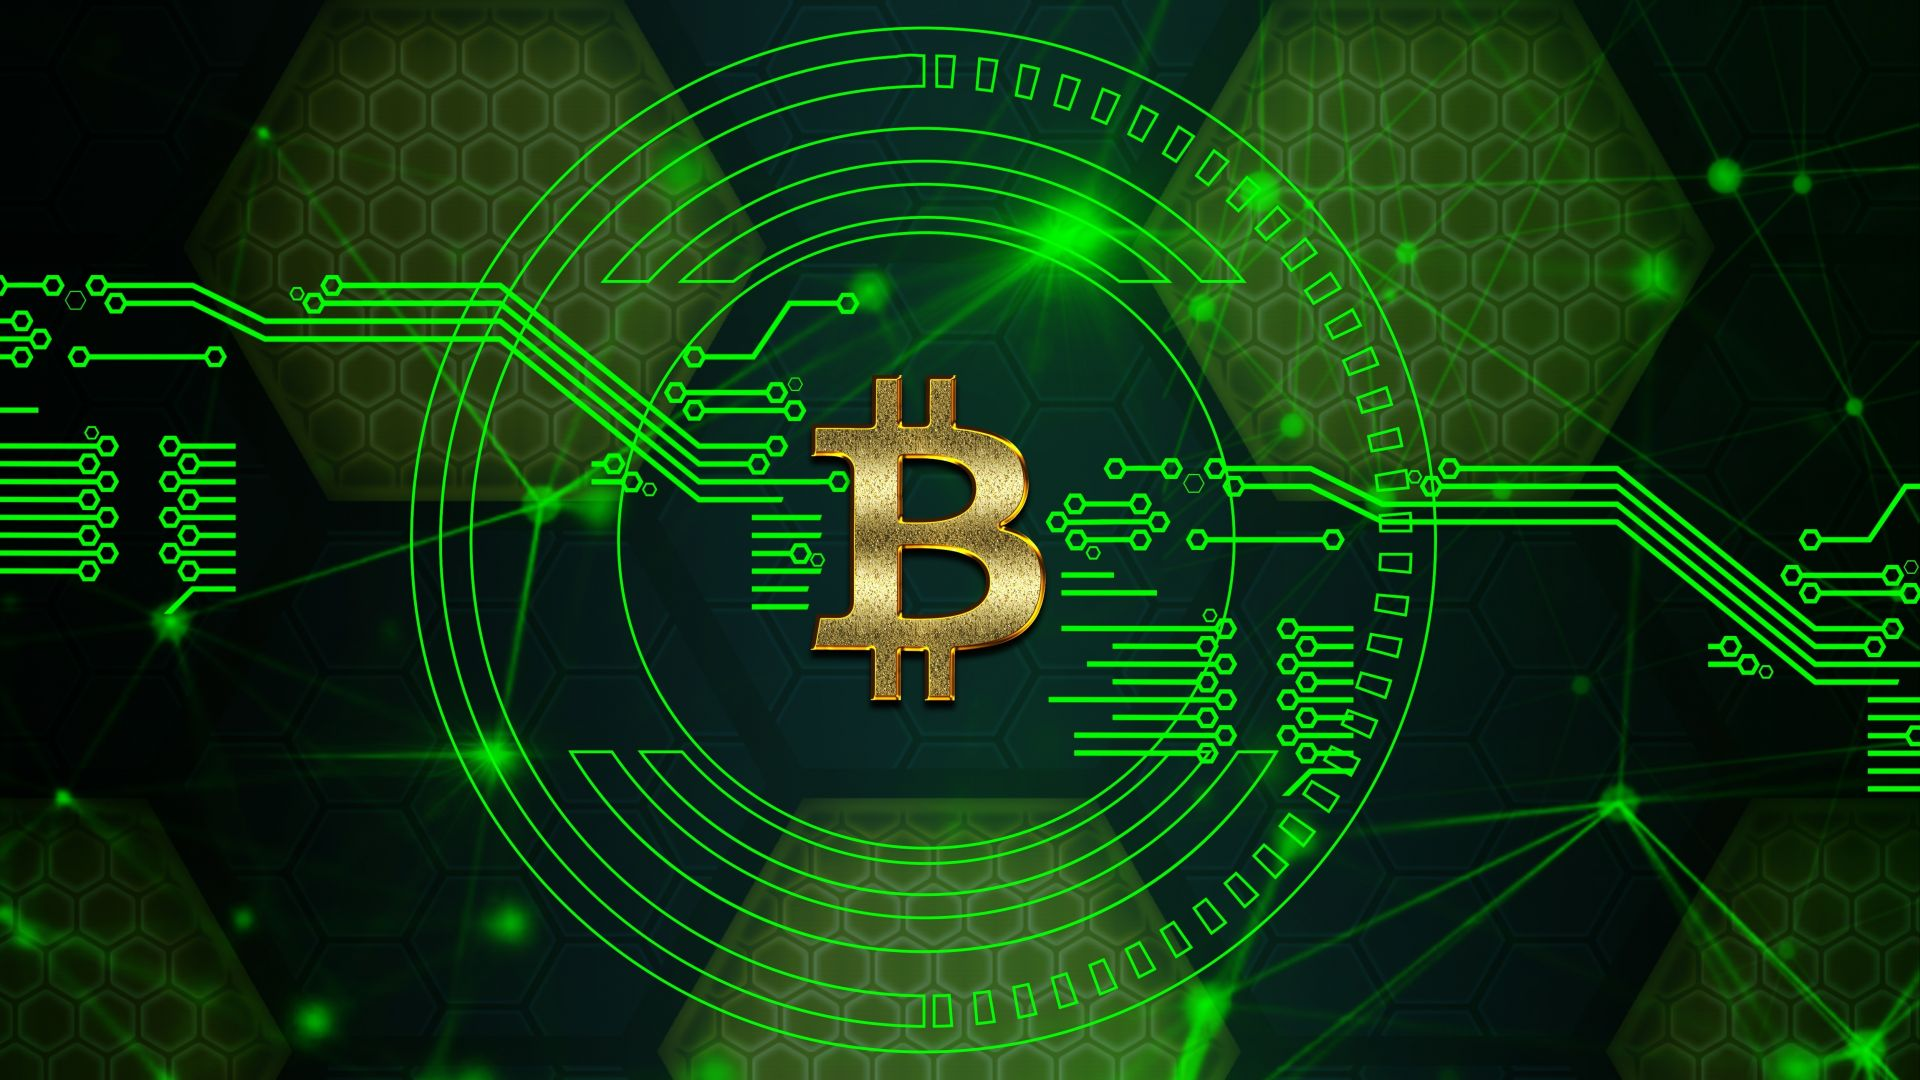 Desktop wallpaper bitcoin digital circuit crypt currency art 1920x1080